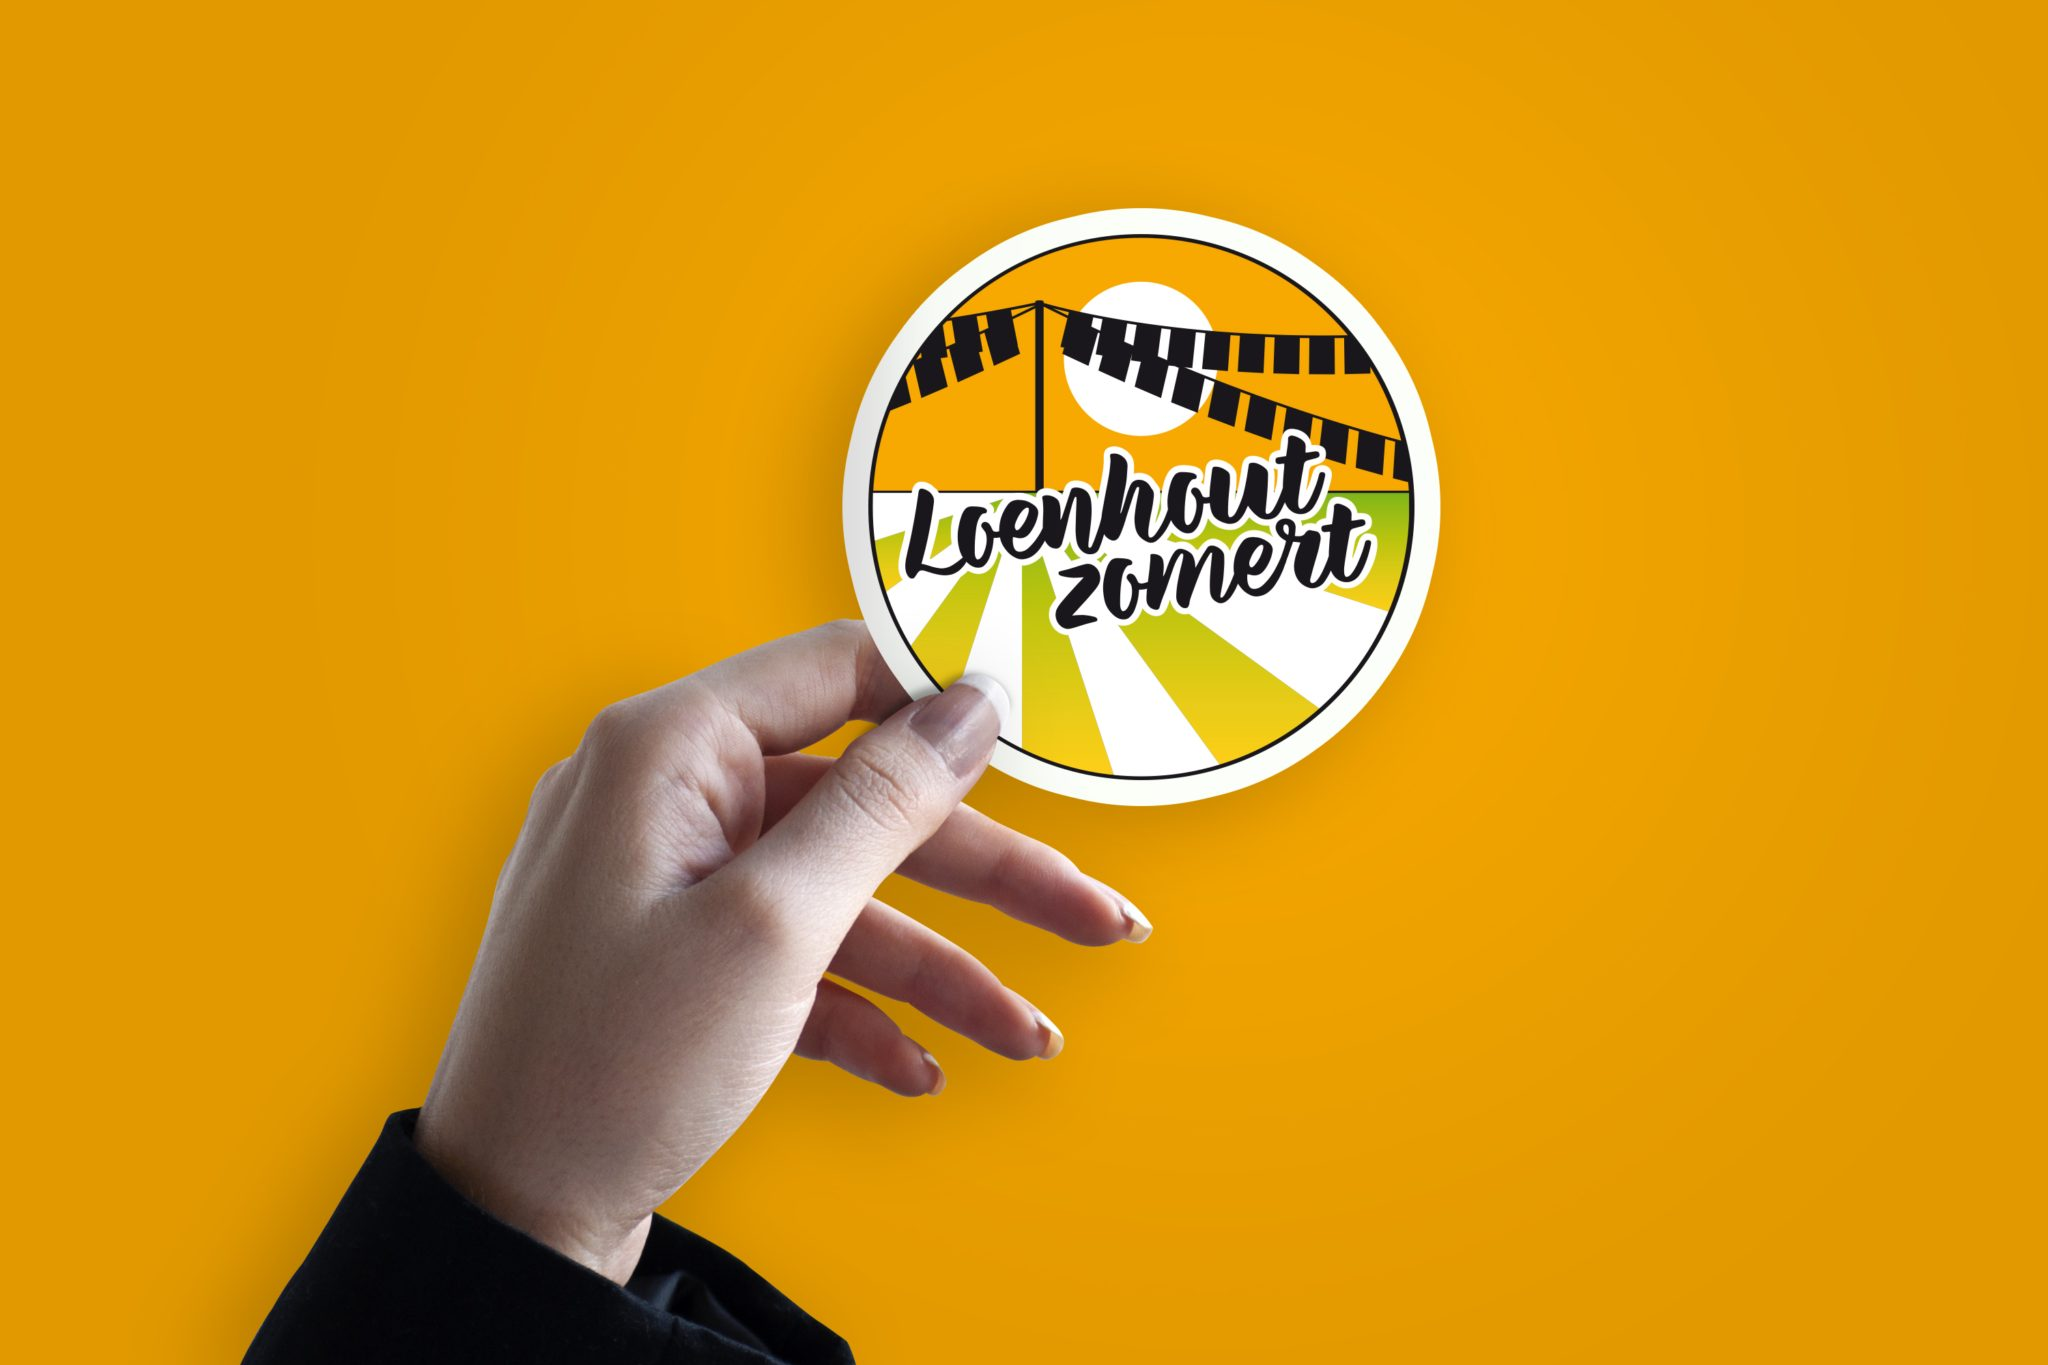 Logo Loenhout Zomert